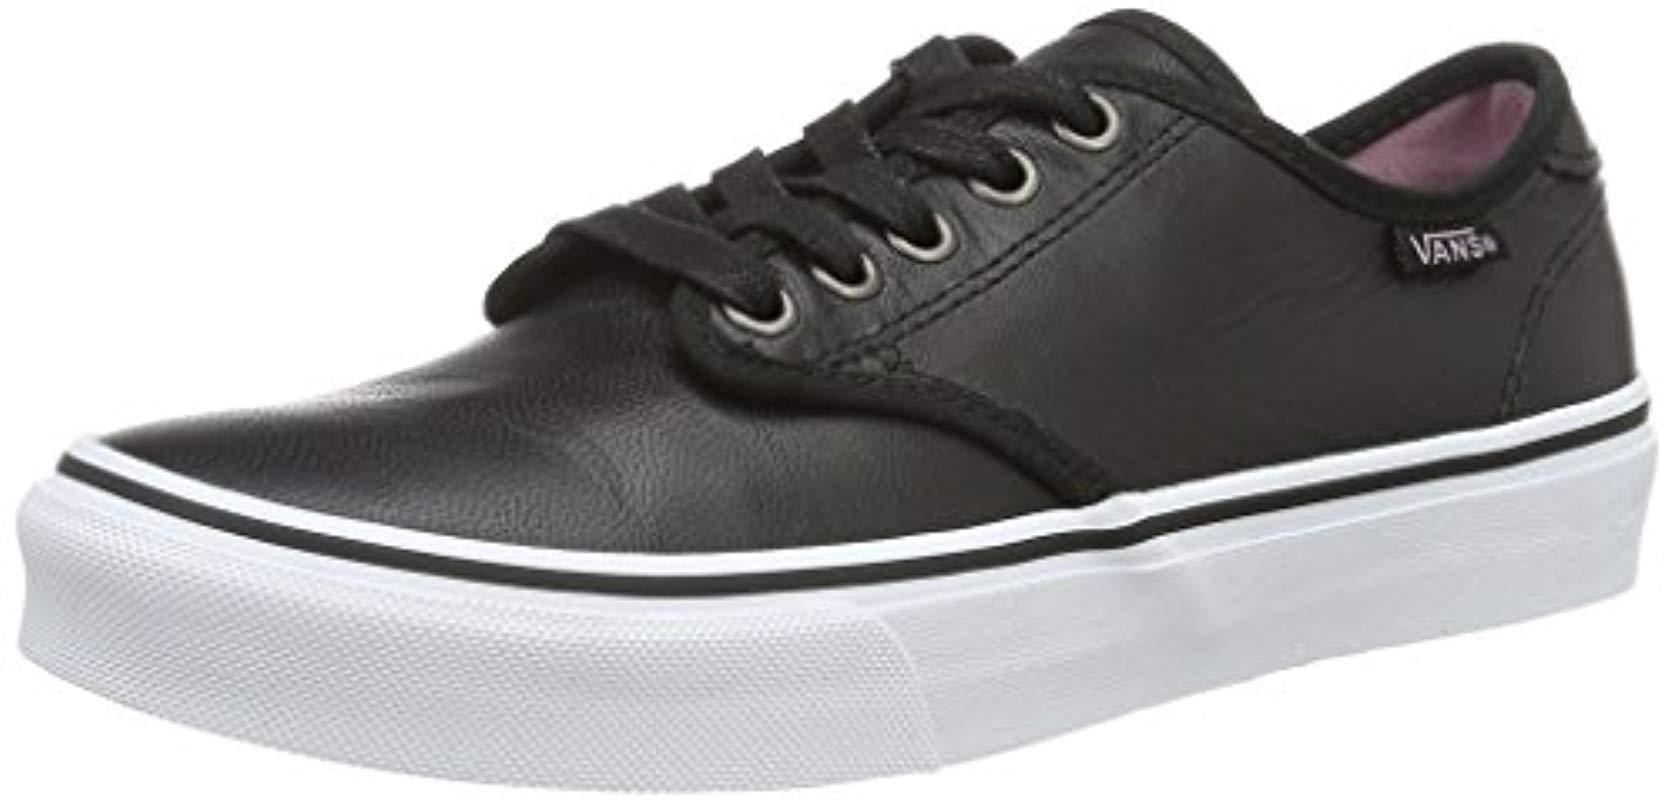 77b4e419a2 Vans - Black  s Camden Dx Low-top Sneakers - Lyst. View fullscreen